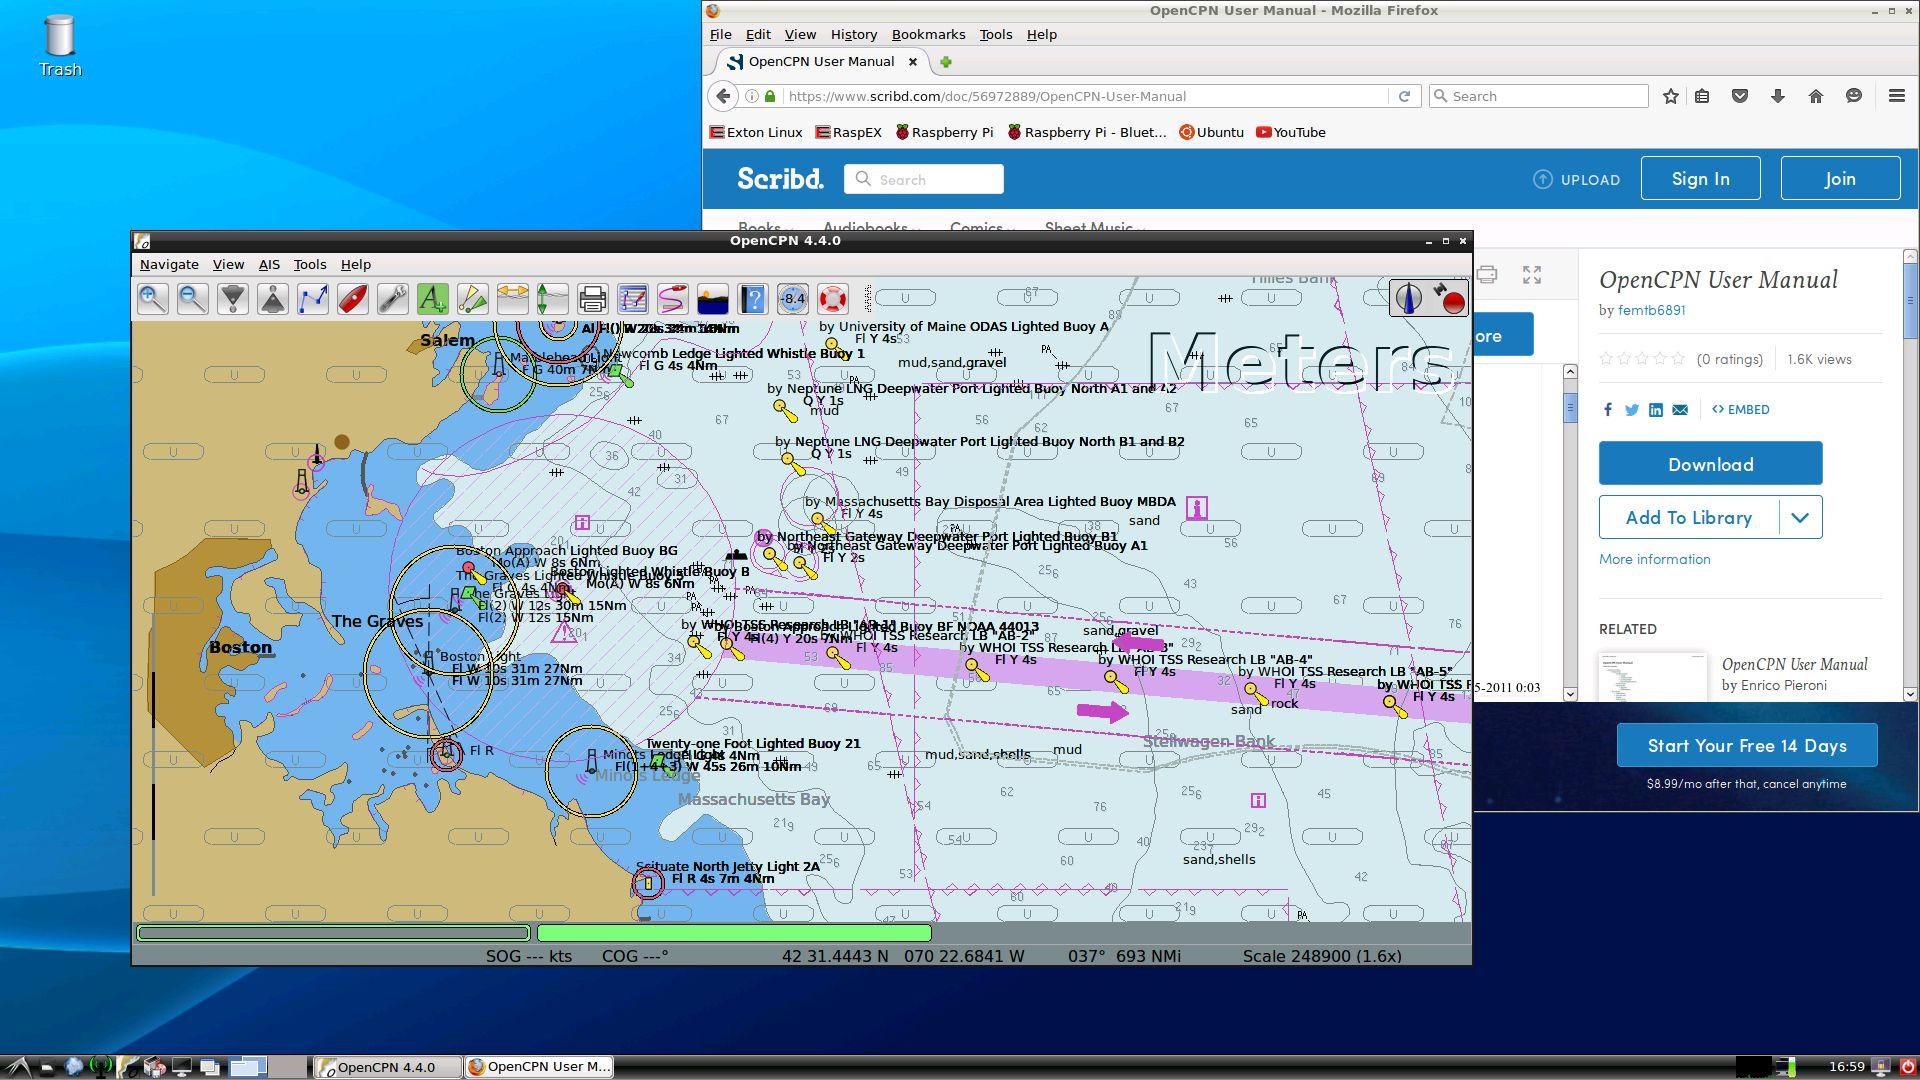 RaspEX for Raspberry Pi 3/2 Build 160703 – based on Ubuntu